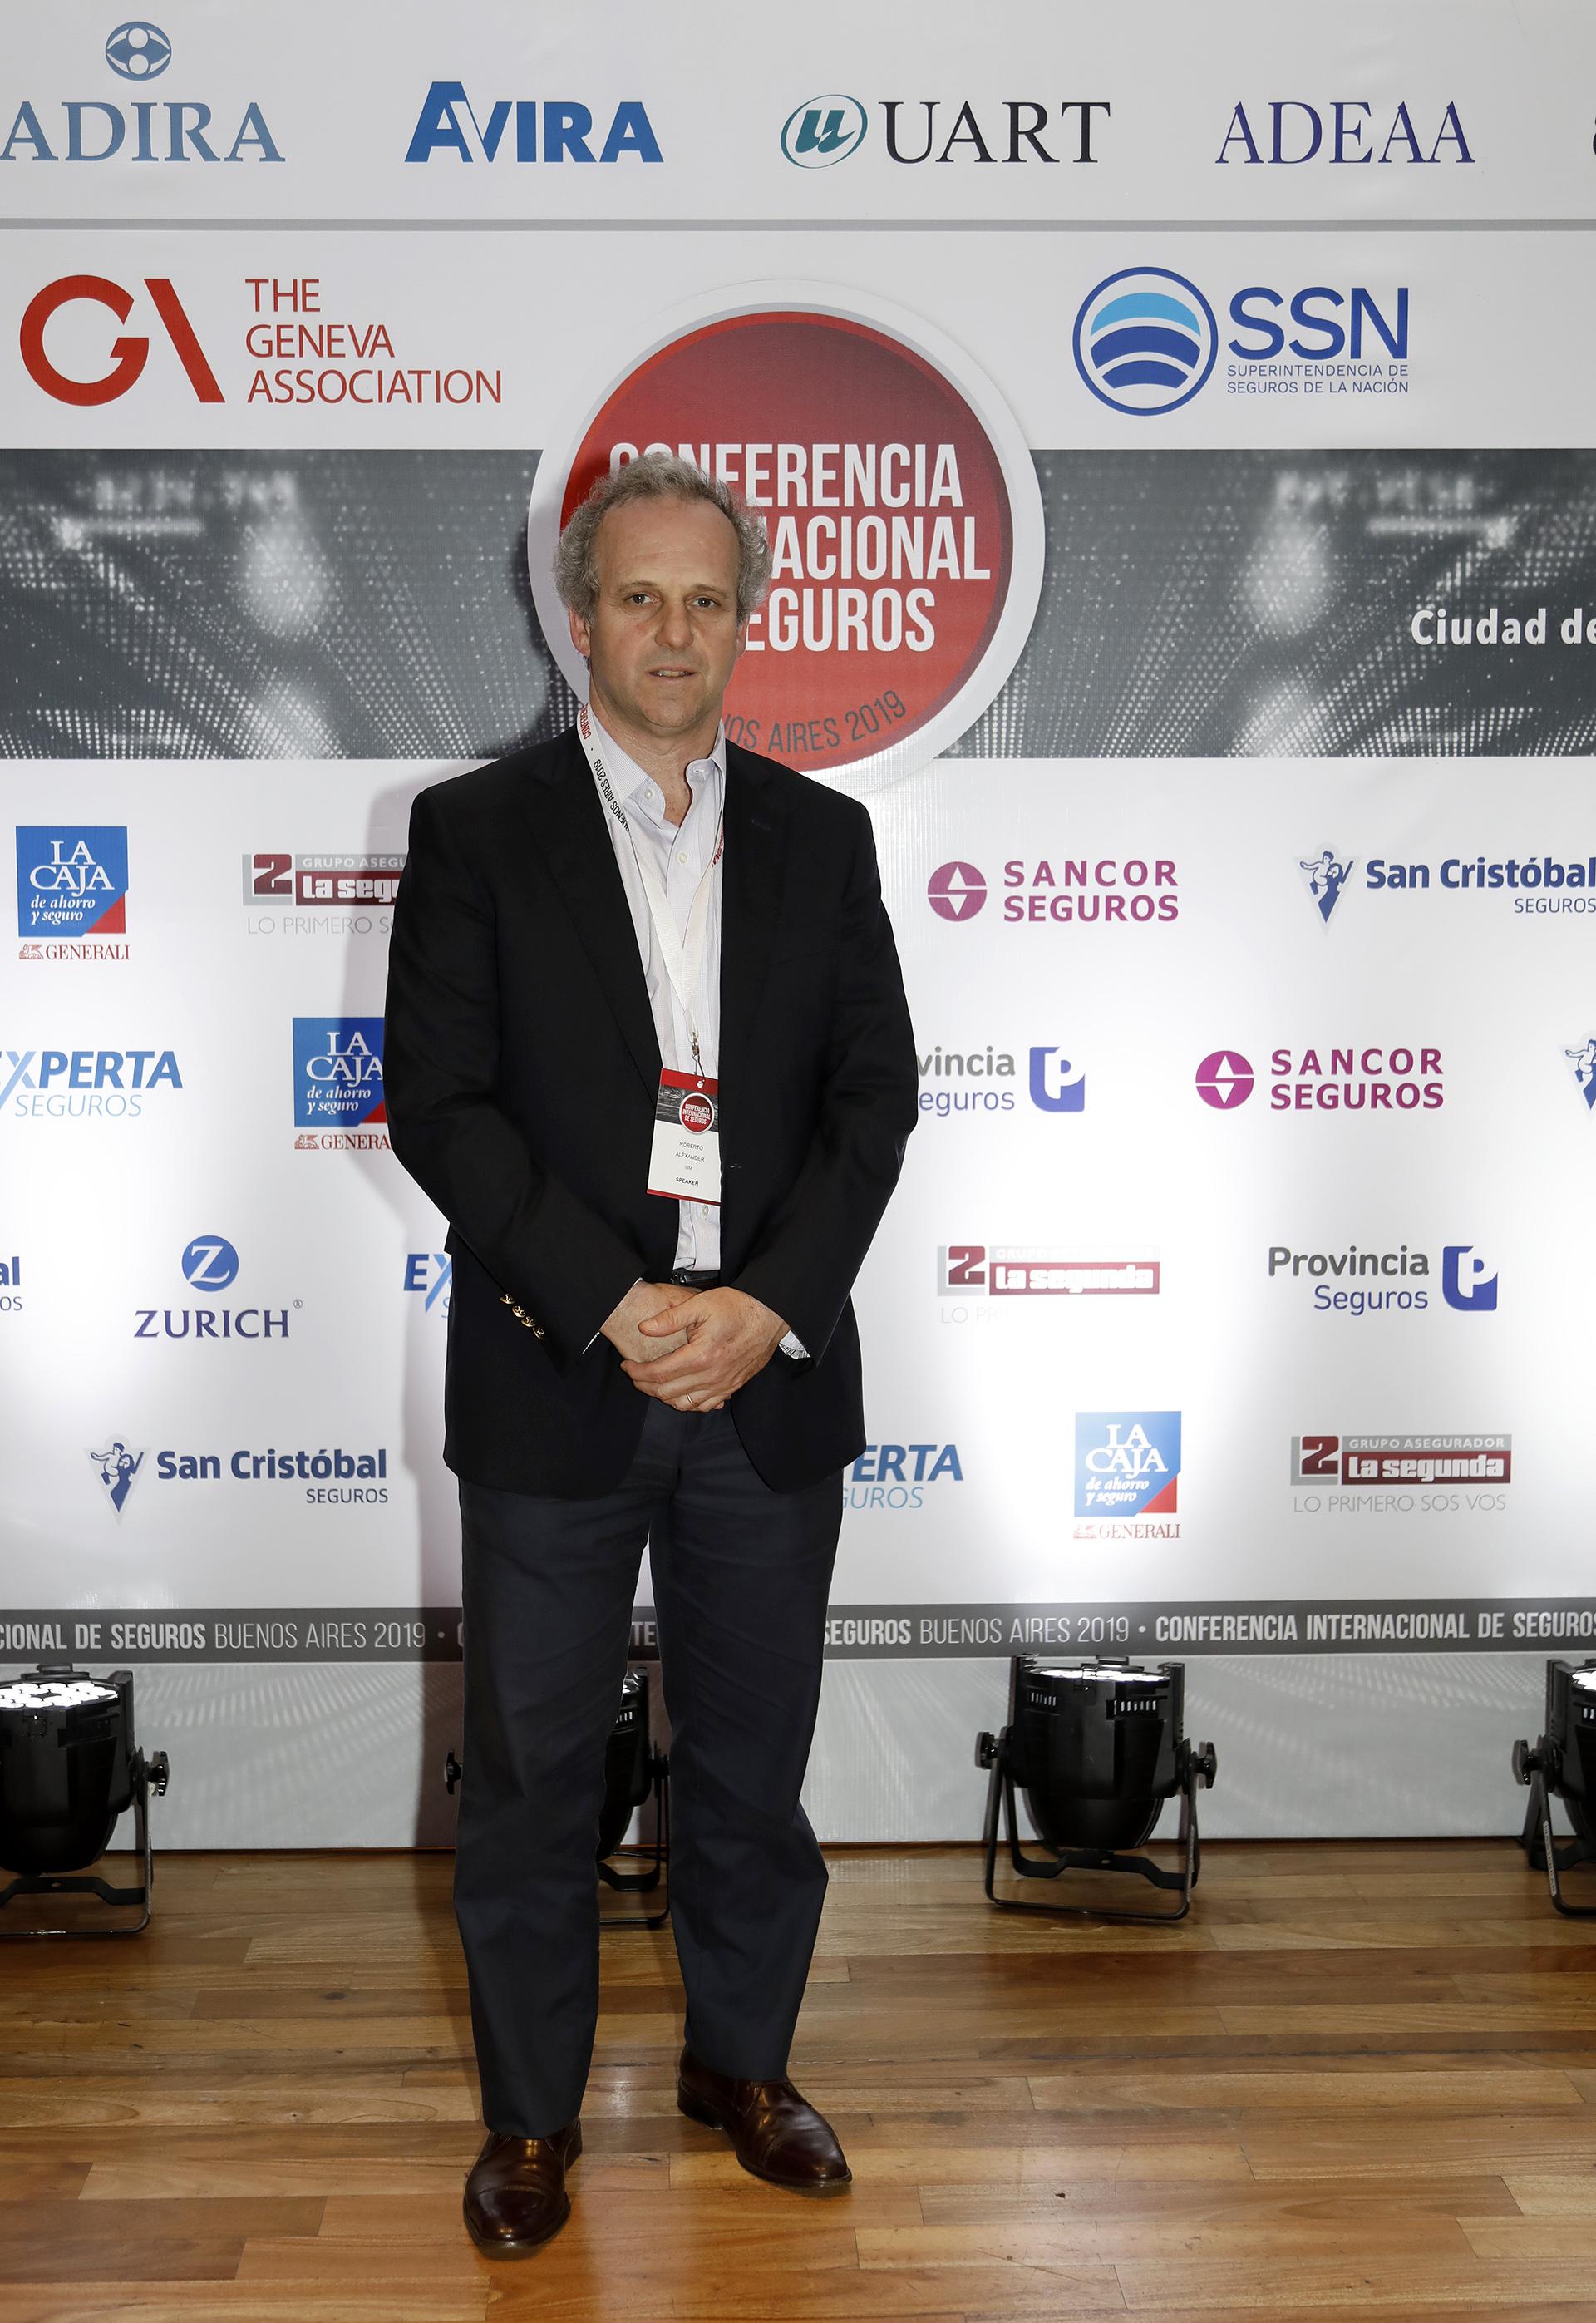 Roberto Alexander, Gerente General de IBM Argentina